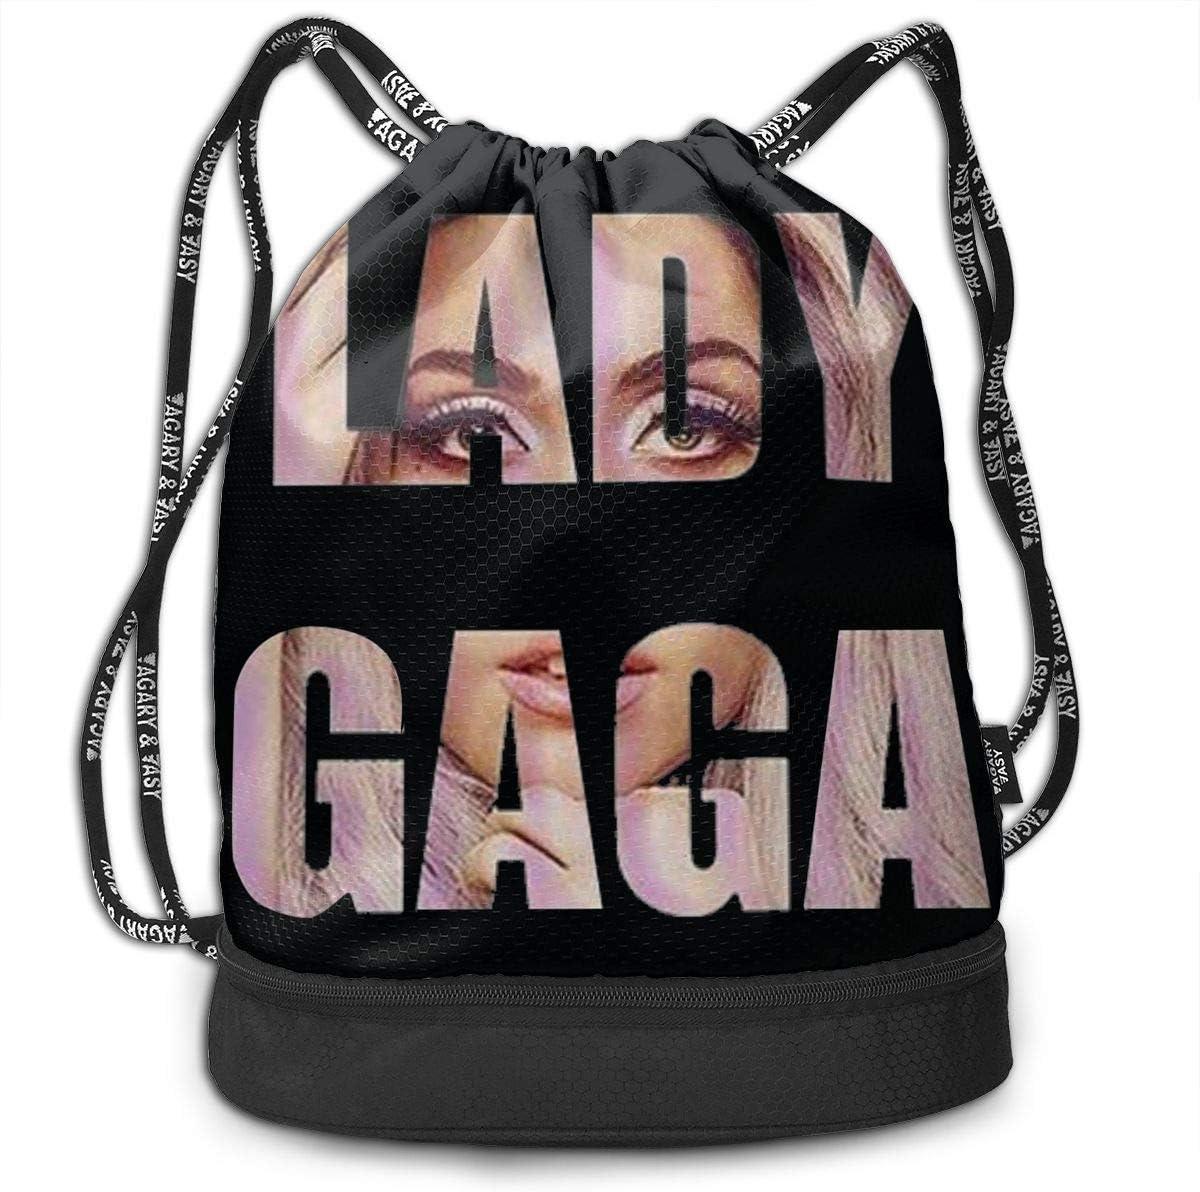 Sacs /à Cordon,Sacs de Sport,Sacs /à Dos Loisir Lady Gaga Love Leisure Tennis Men Women Gym Drawstring Backpacks Shoulder Bags Sport Sack Backpack for Sport Yoga Trip